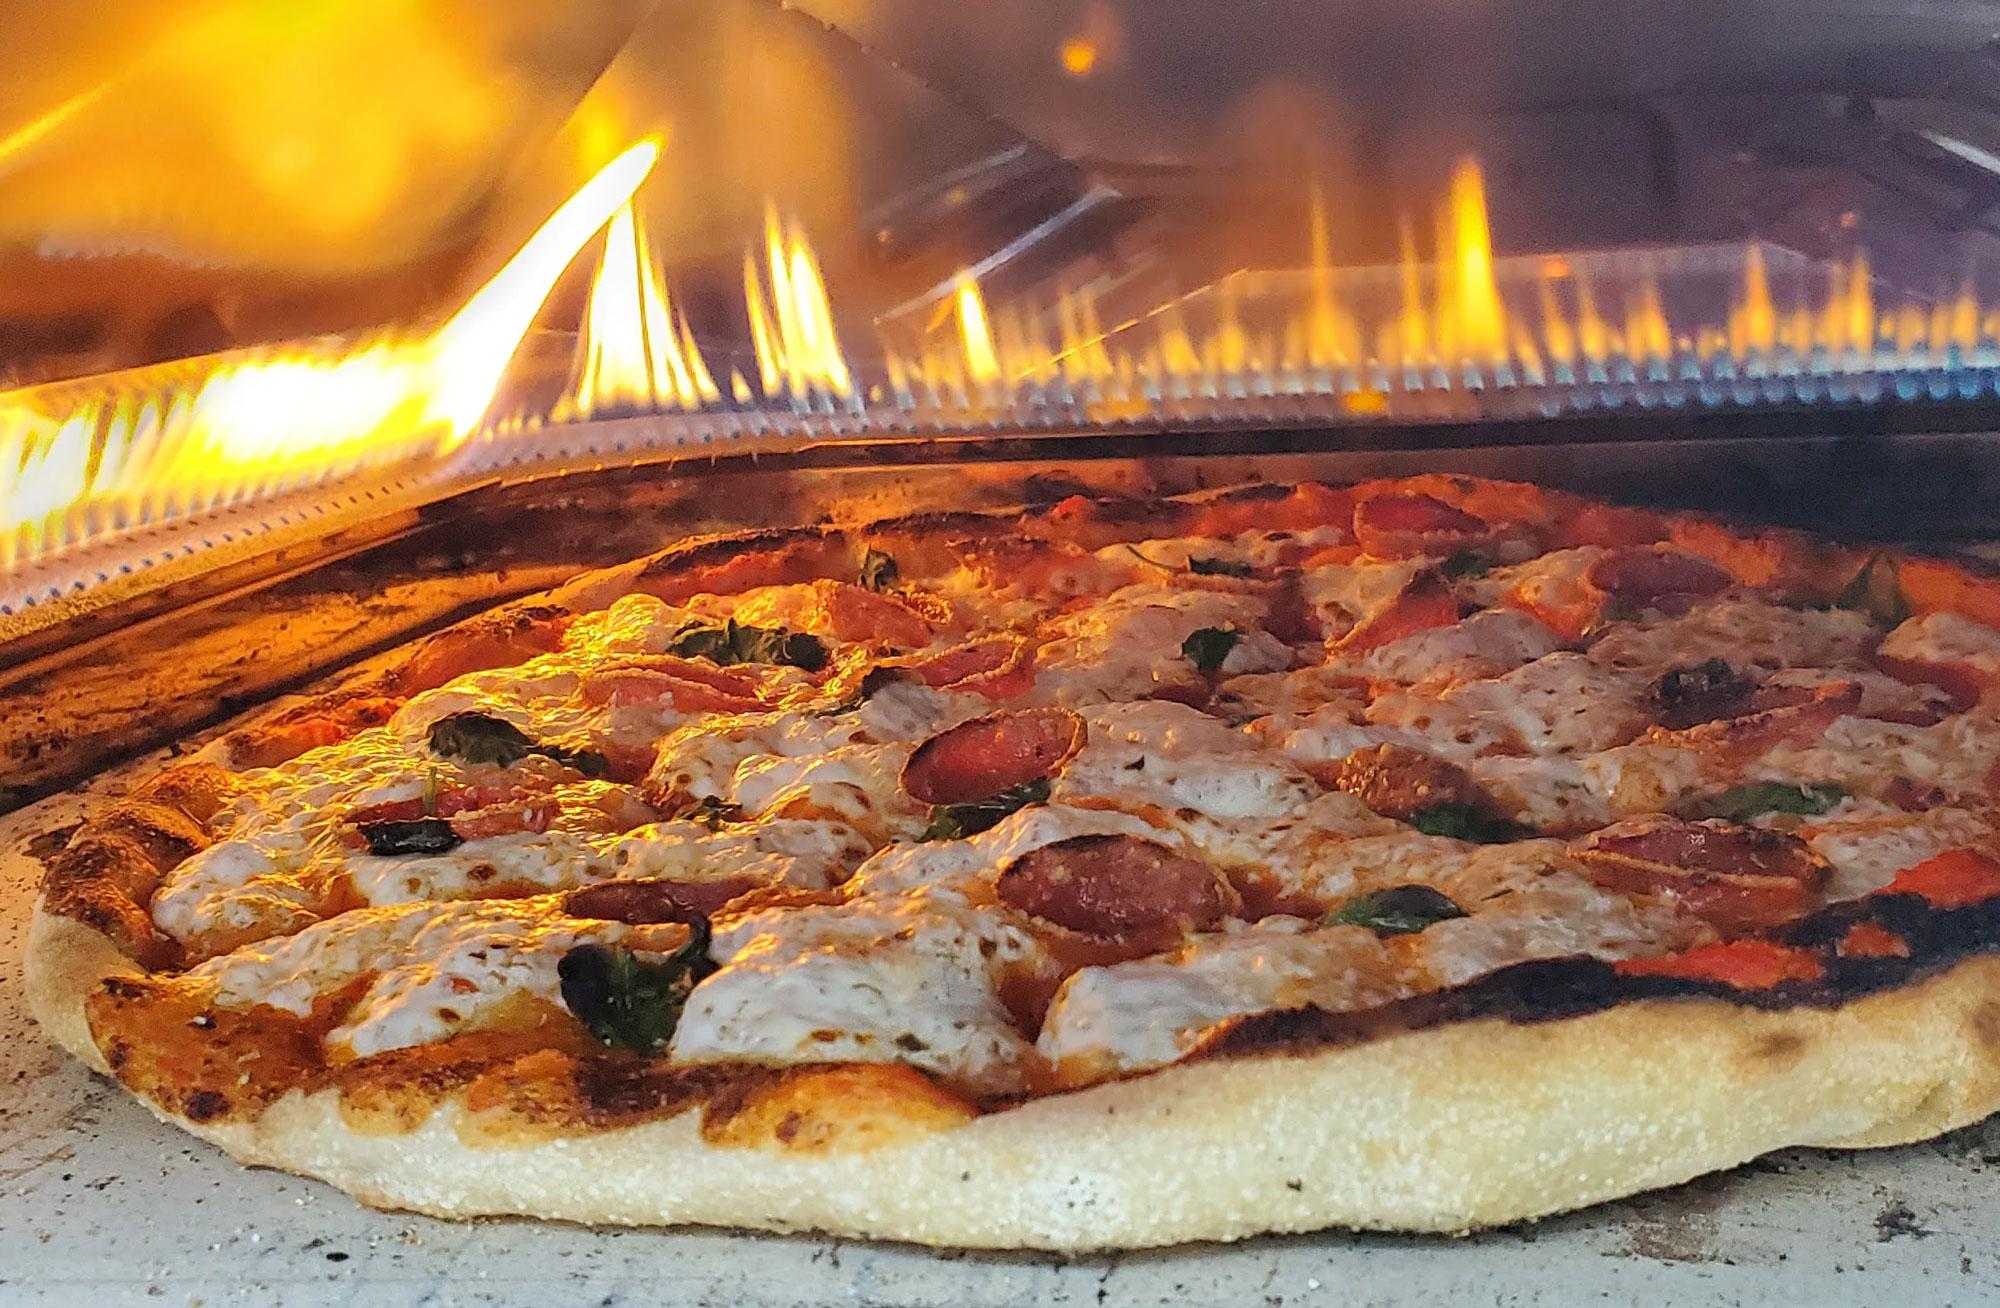 ooni-koda-16-pizza-fire